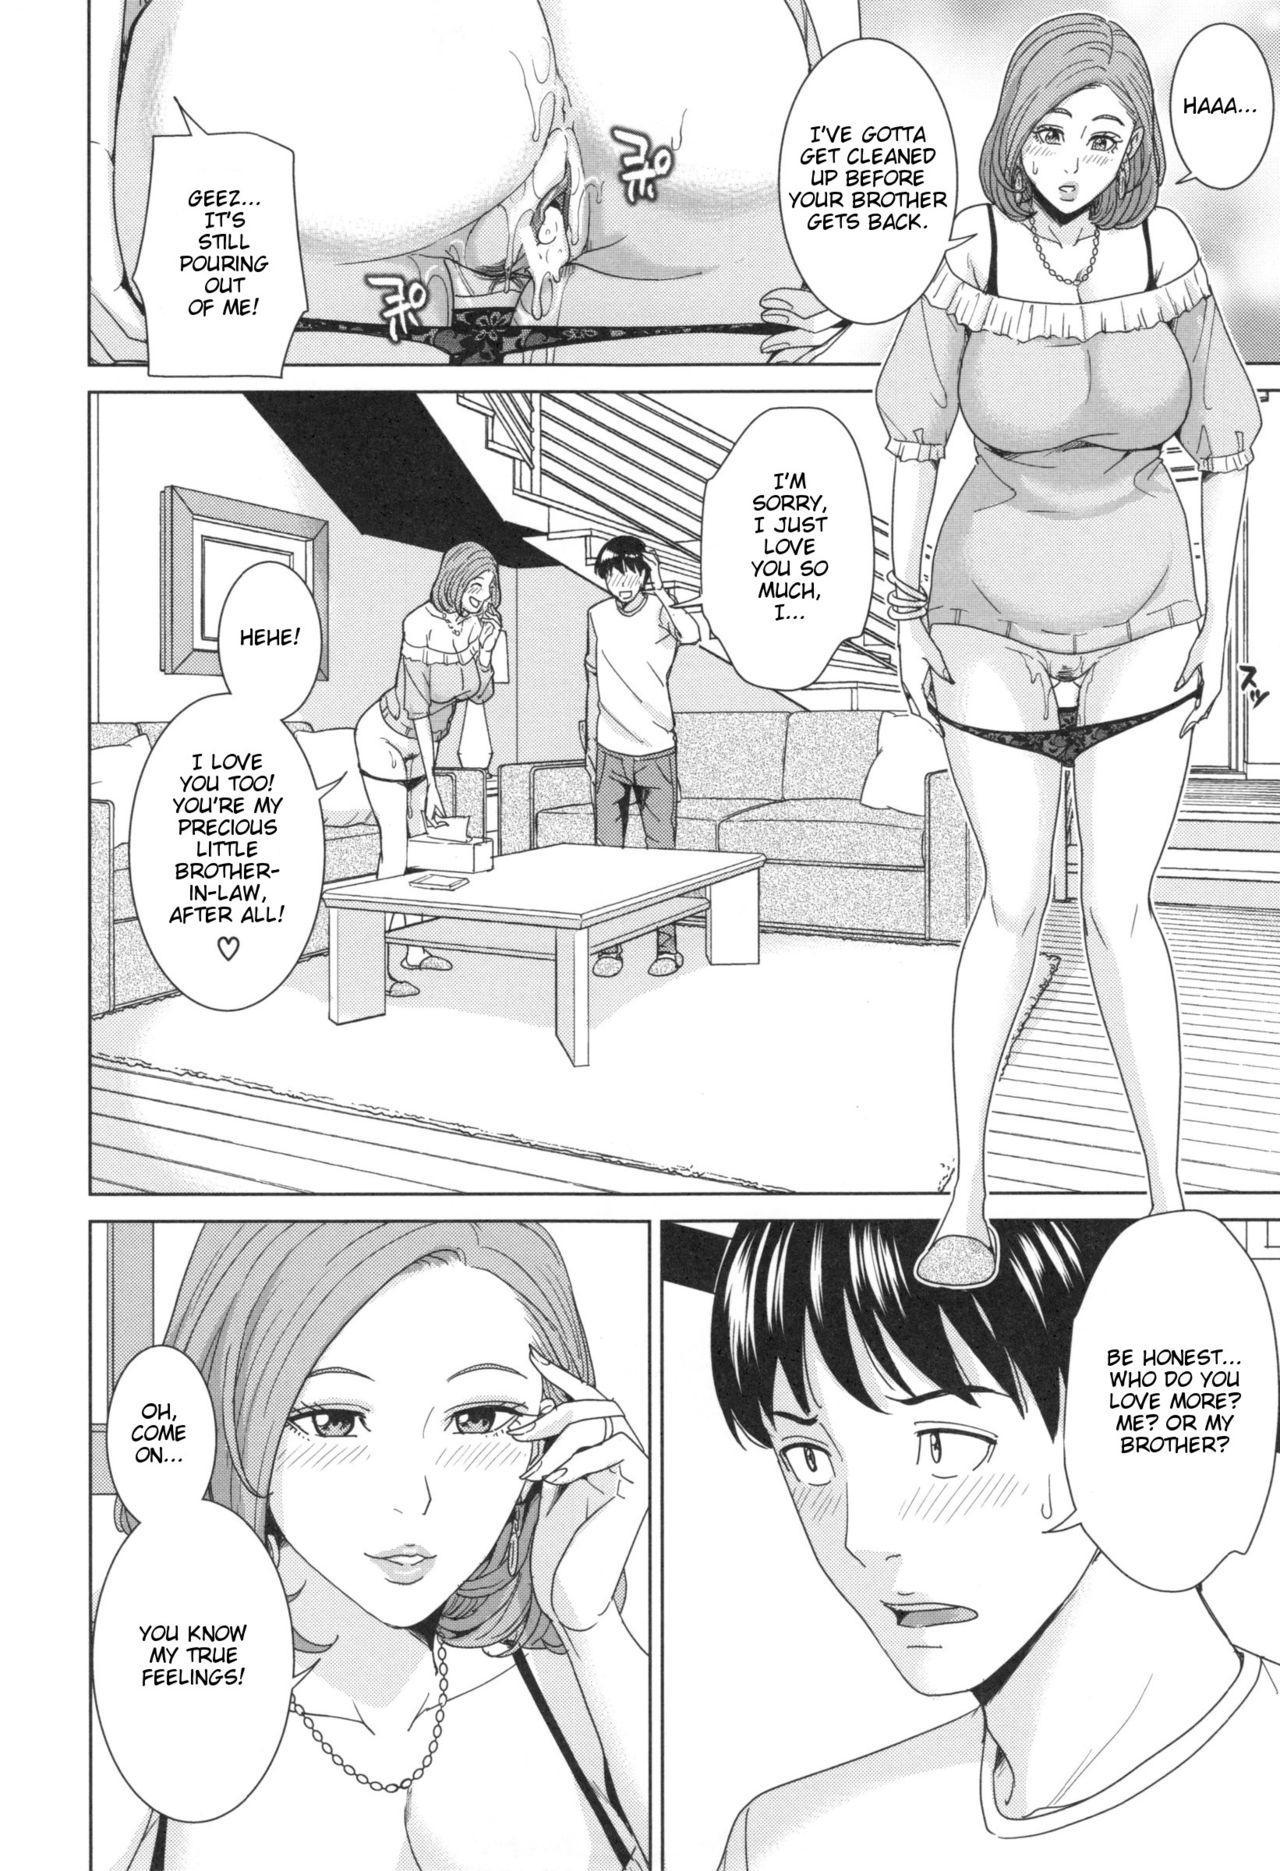 [Maimu-Maimu] Aniyome Bitch Life | Sister-in-Law Slut Life [English] {Taihen Zombii} 40